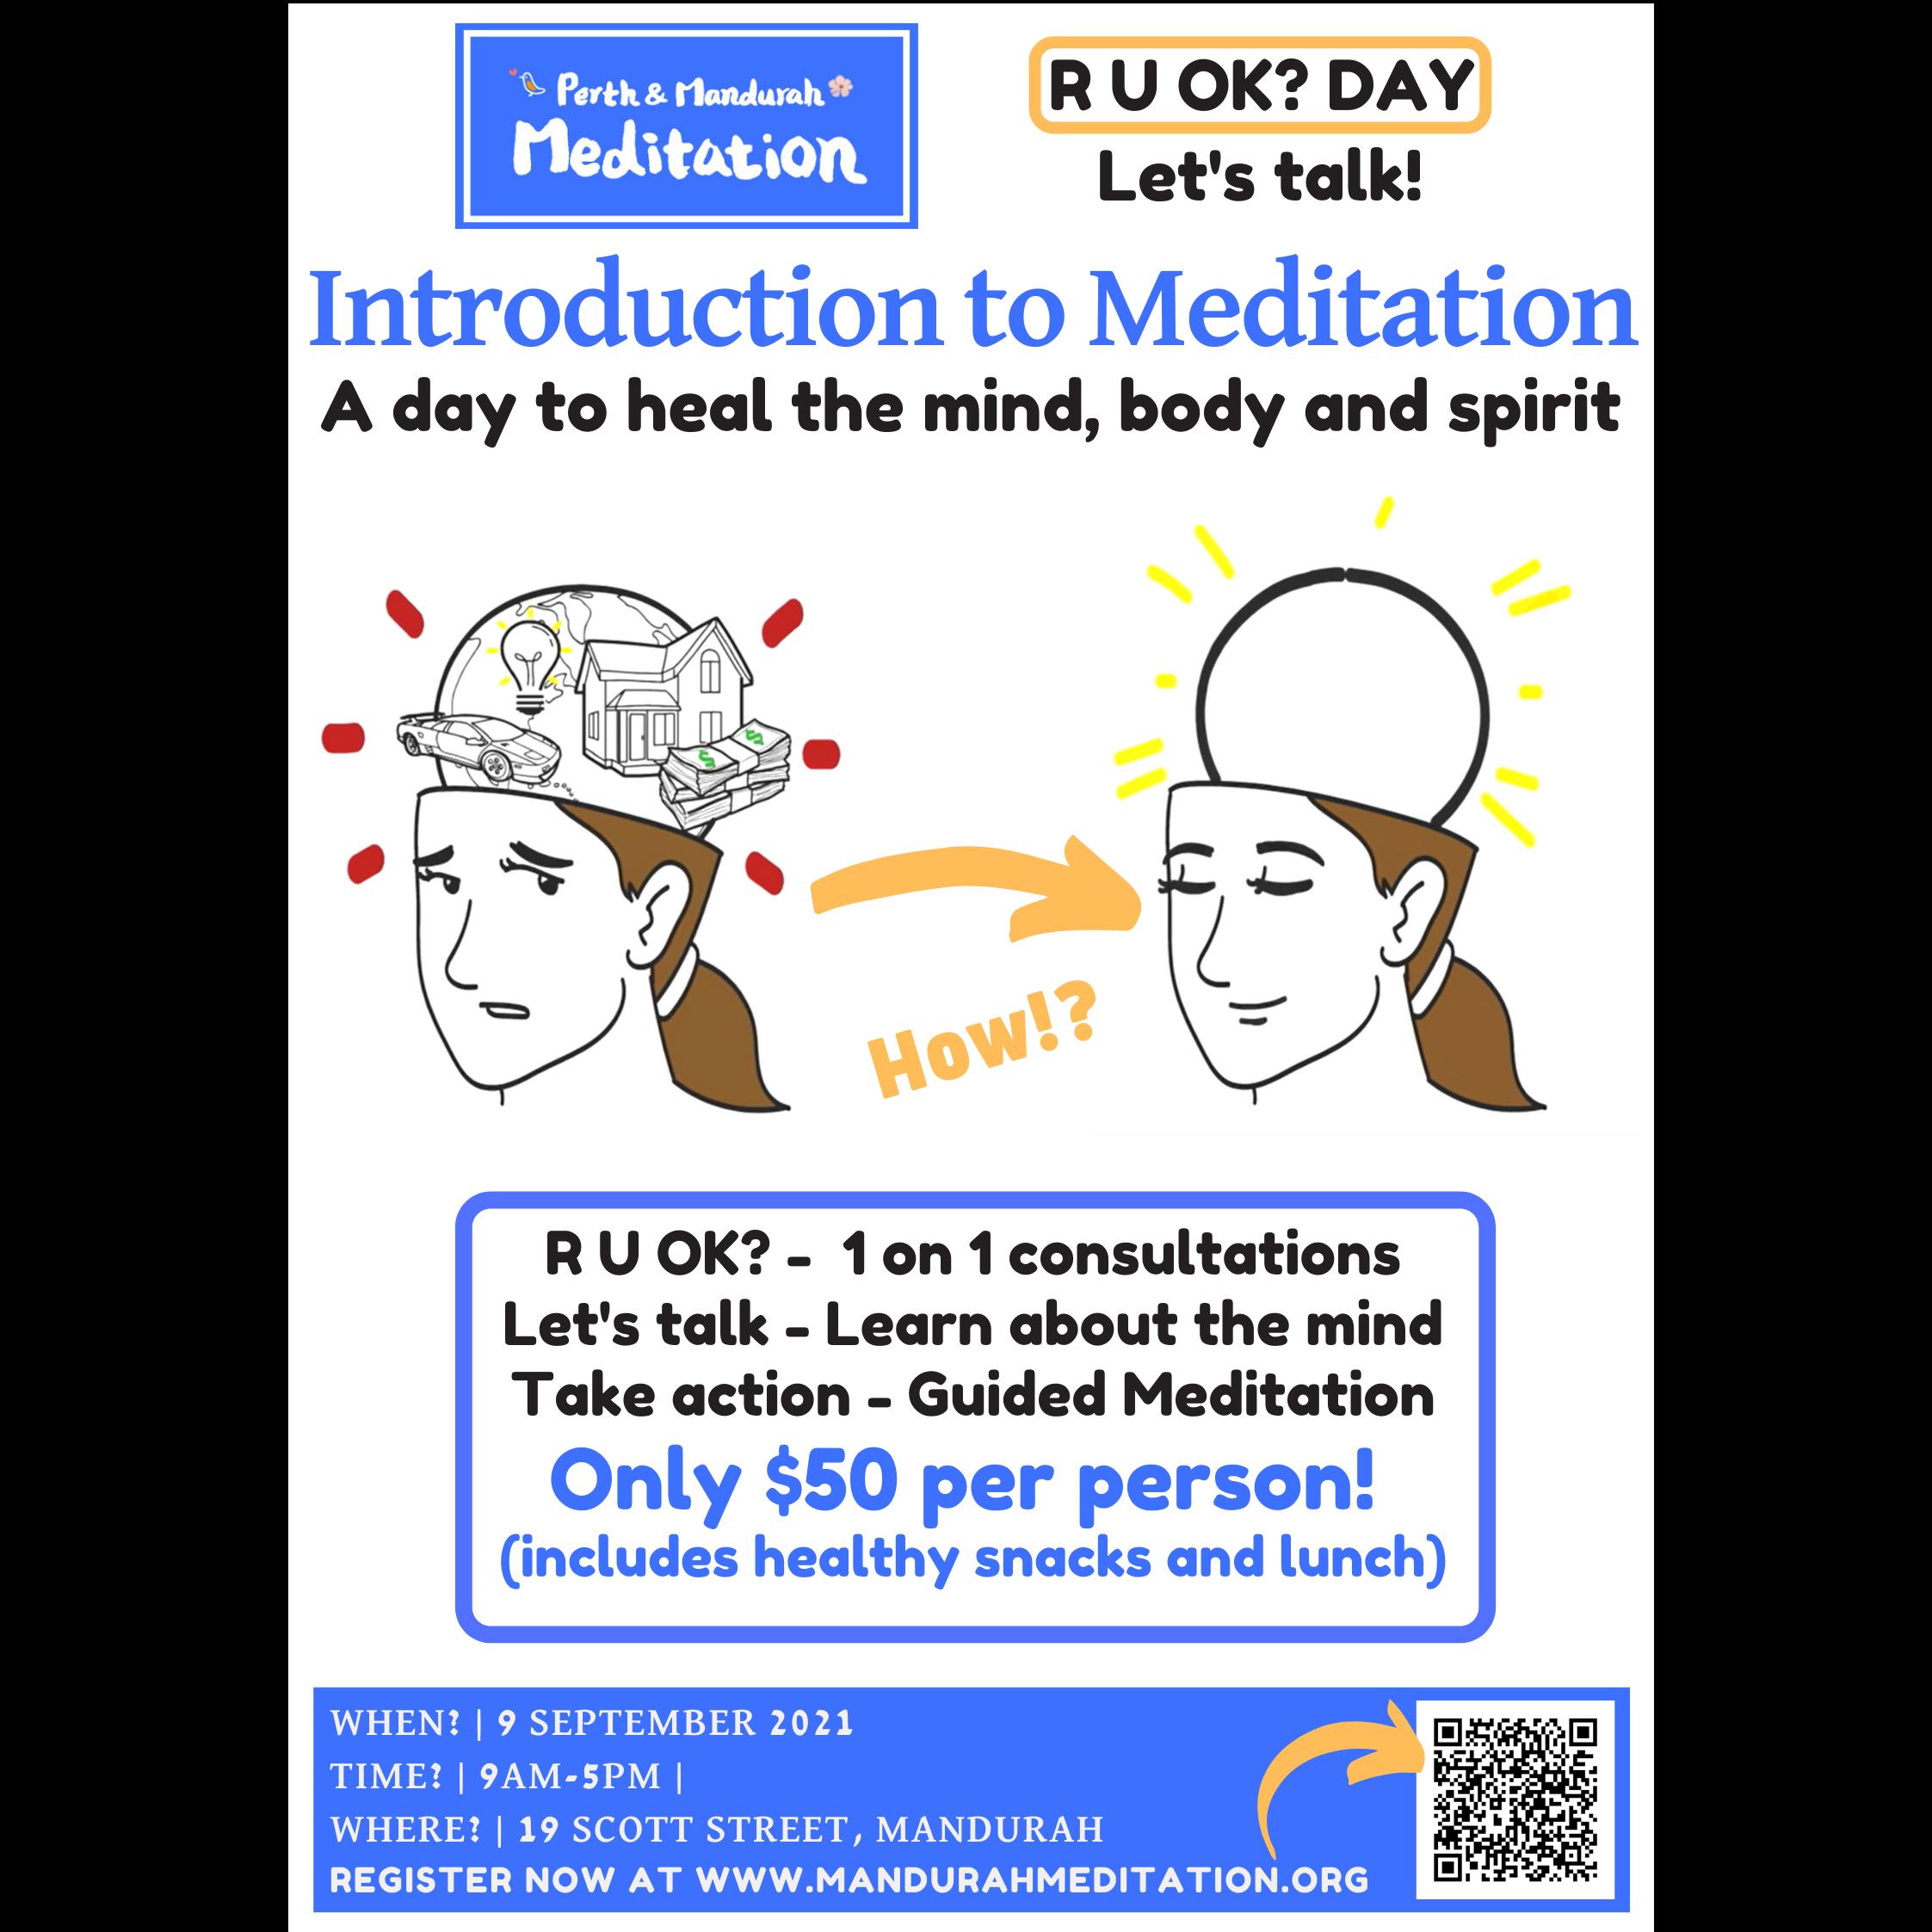 R U OK Day - Introduction to Meditation